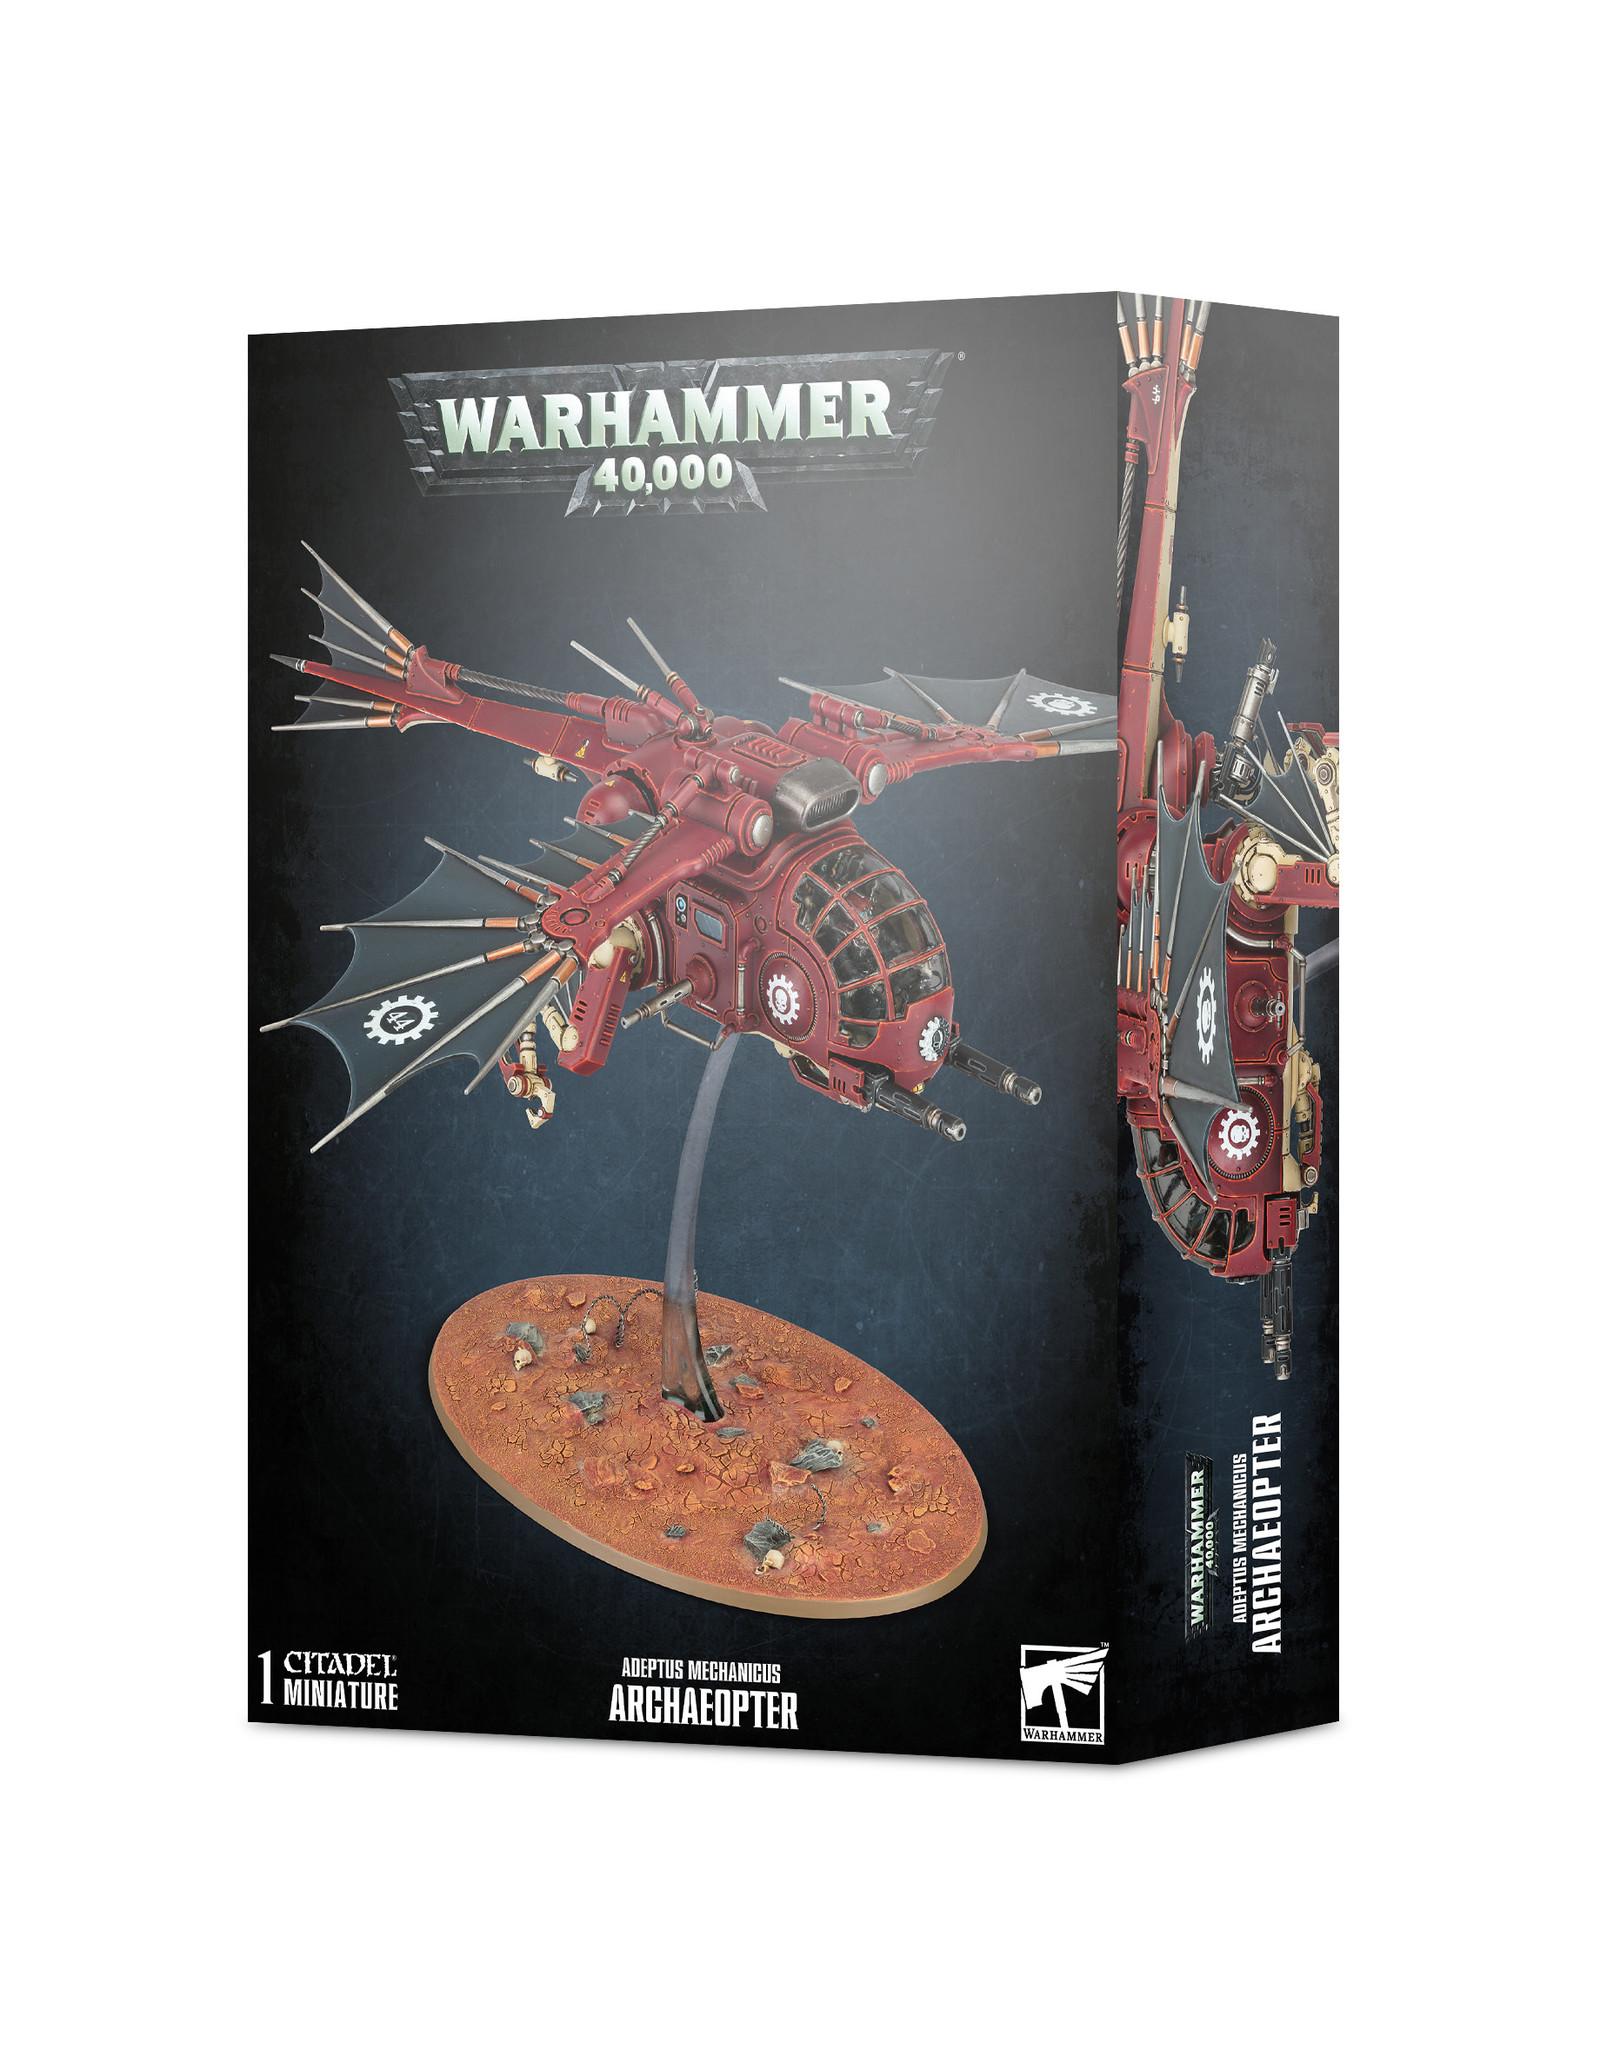 Warhammer 40,000 Adeptus Mechanicus: Archaeopter